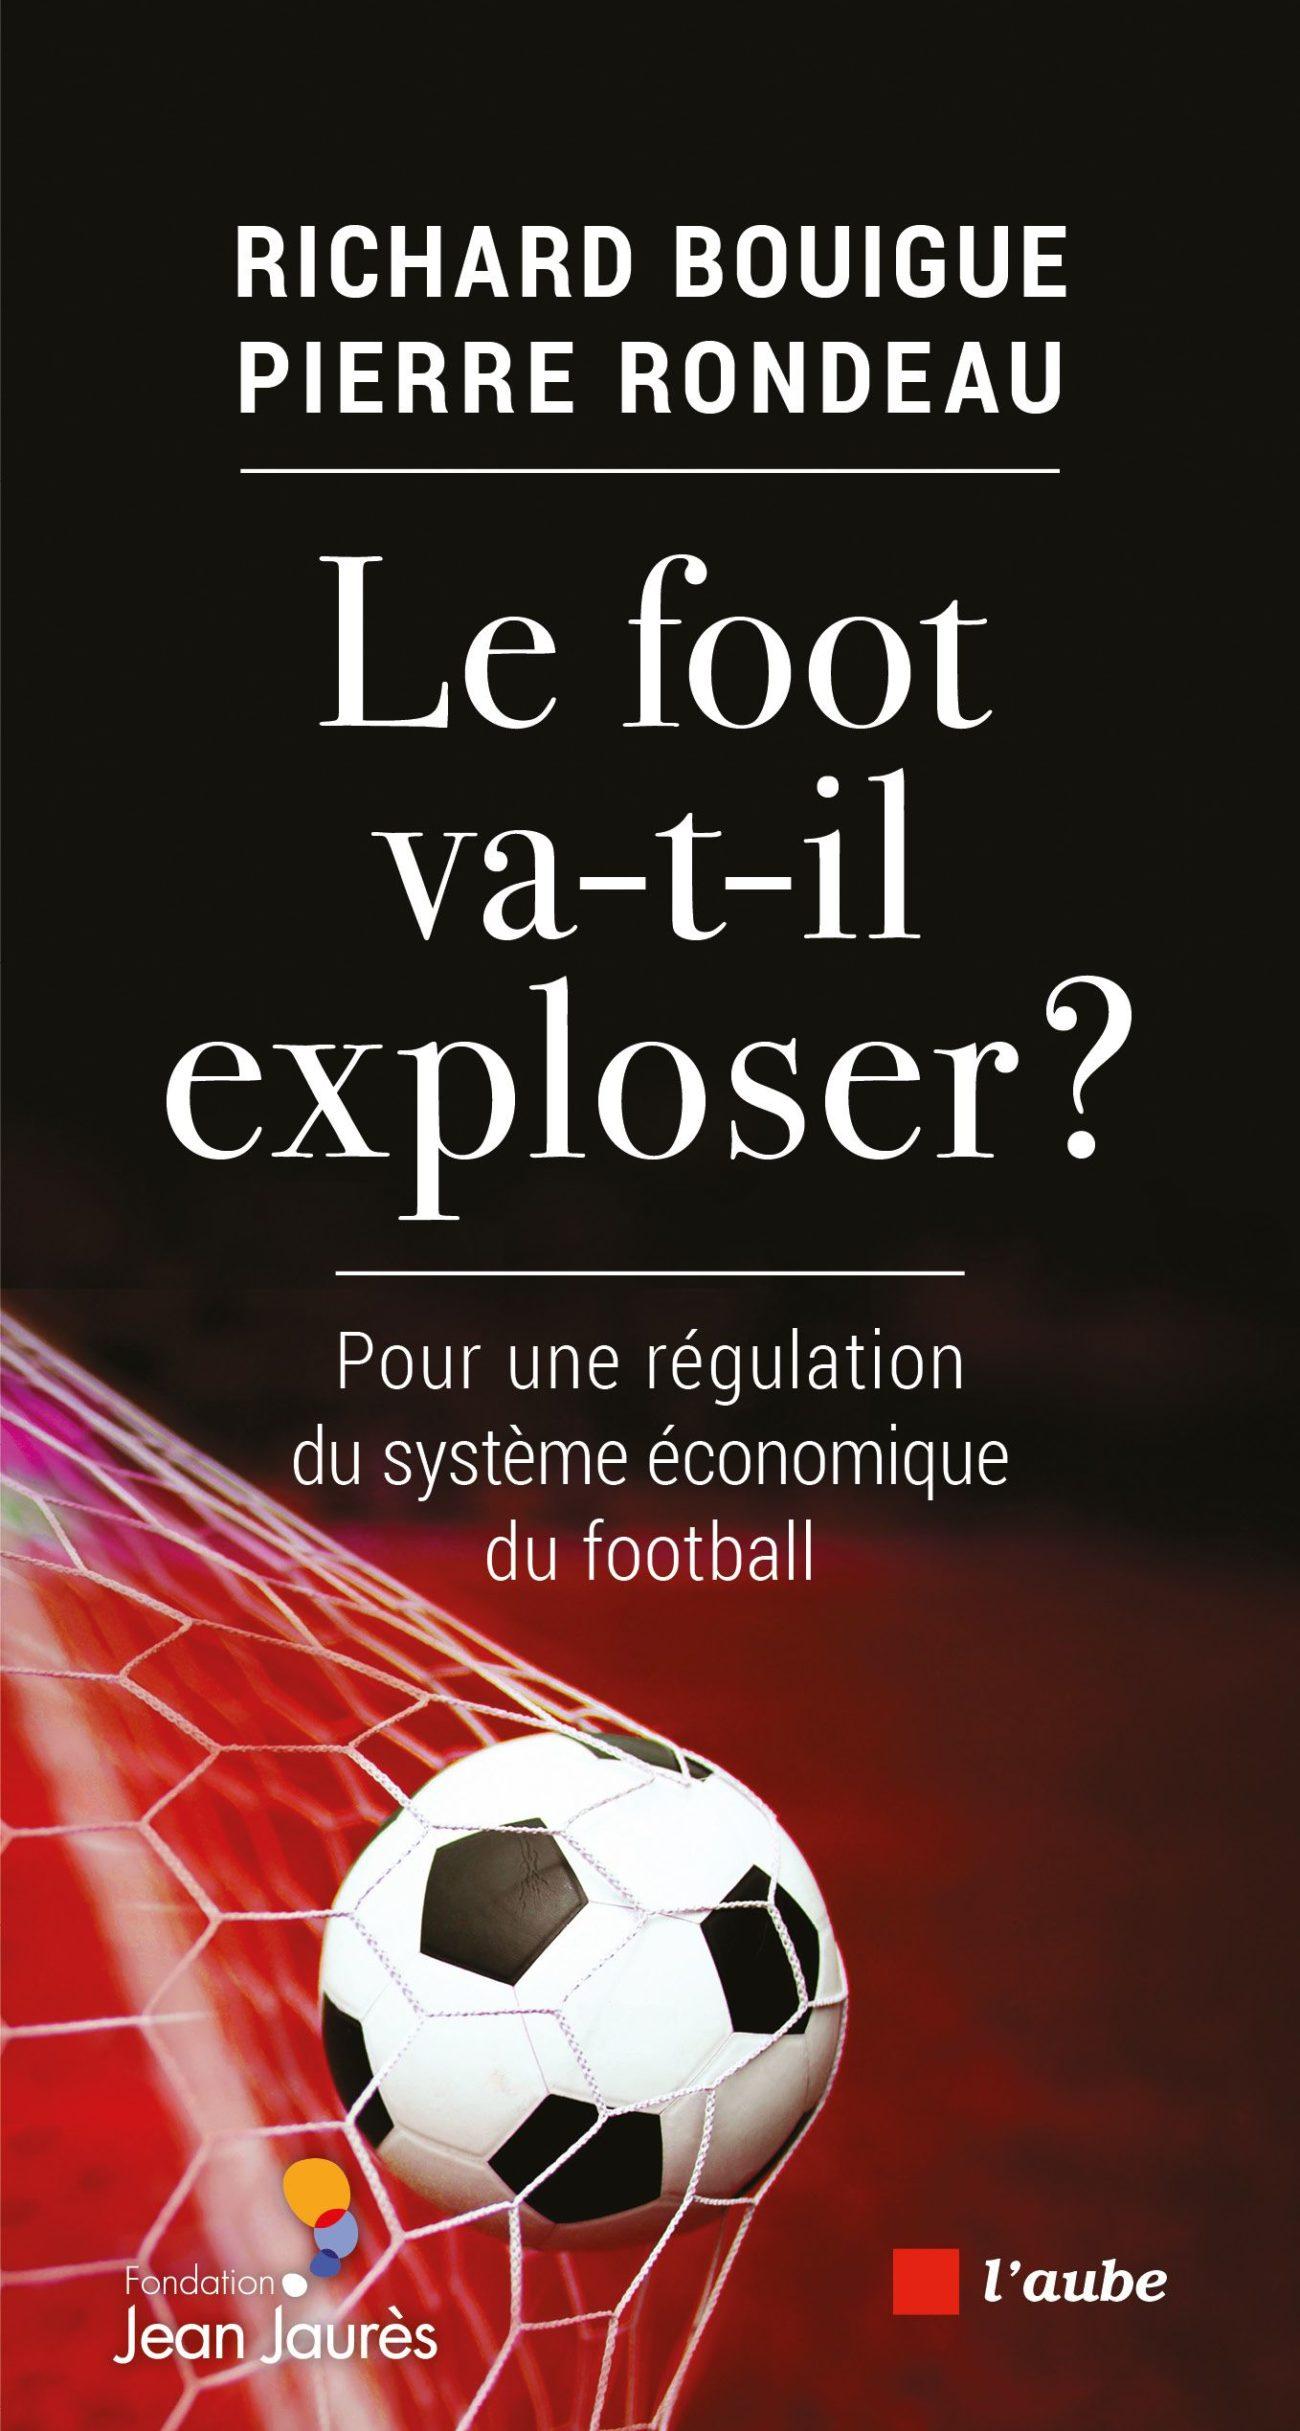 Le foot va-t-il exploser ?